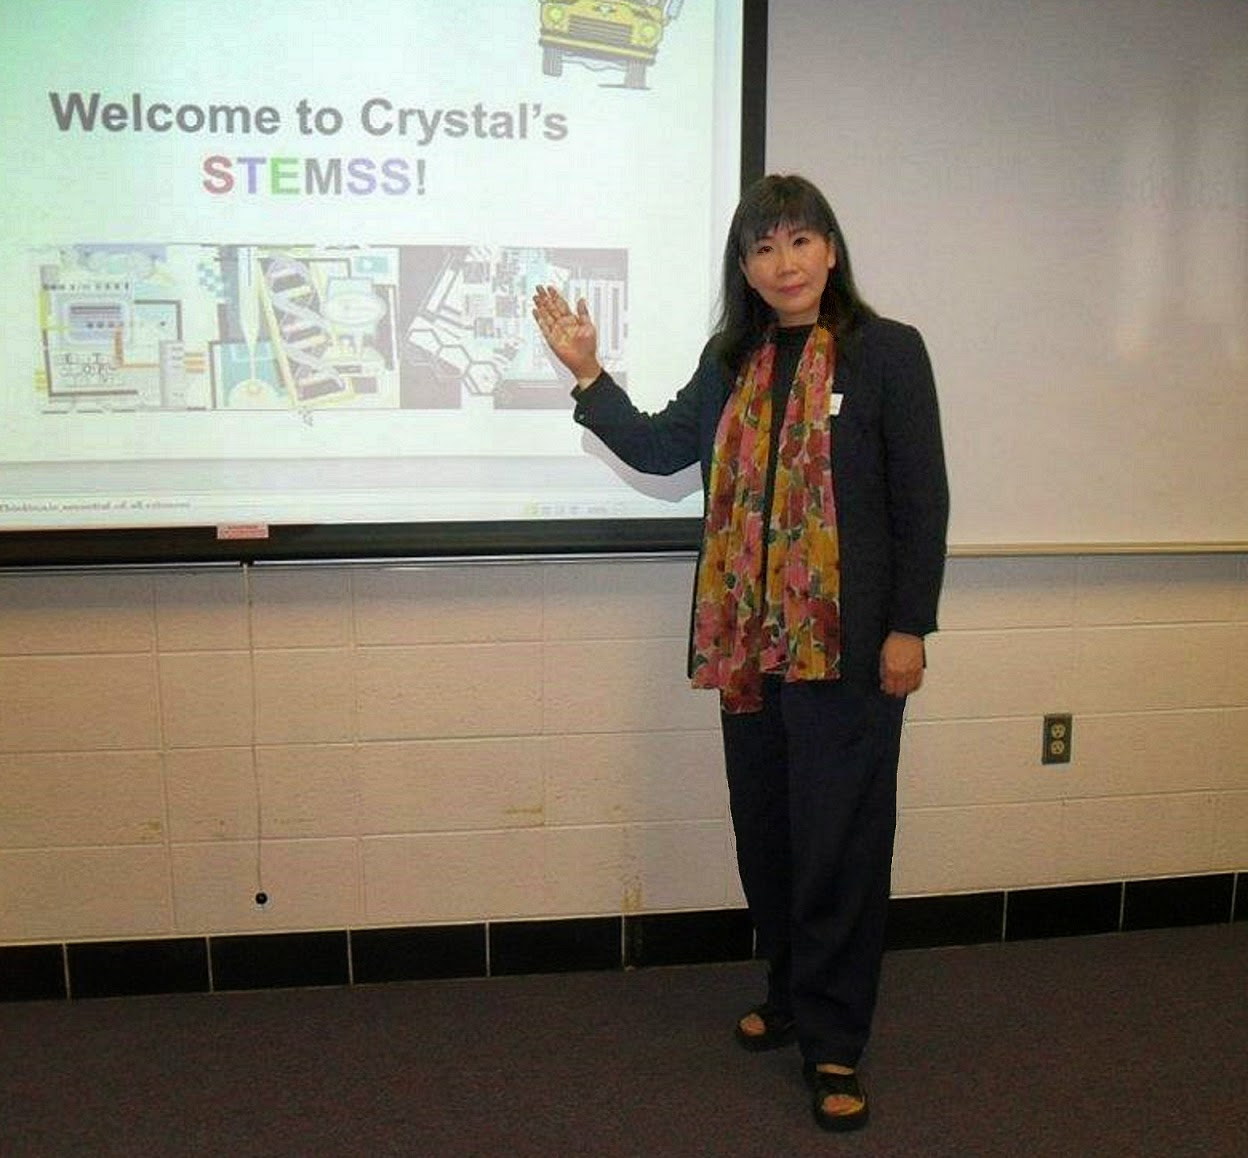 STEM+SS Presentation, May 2012